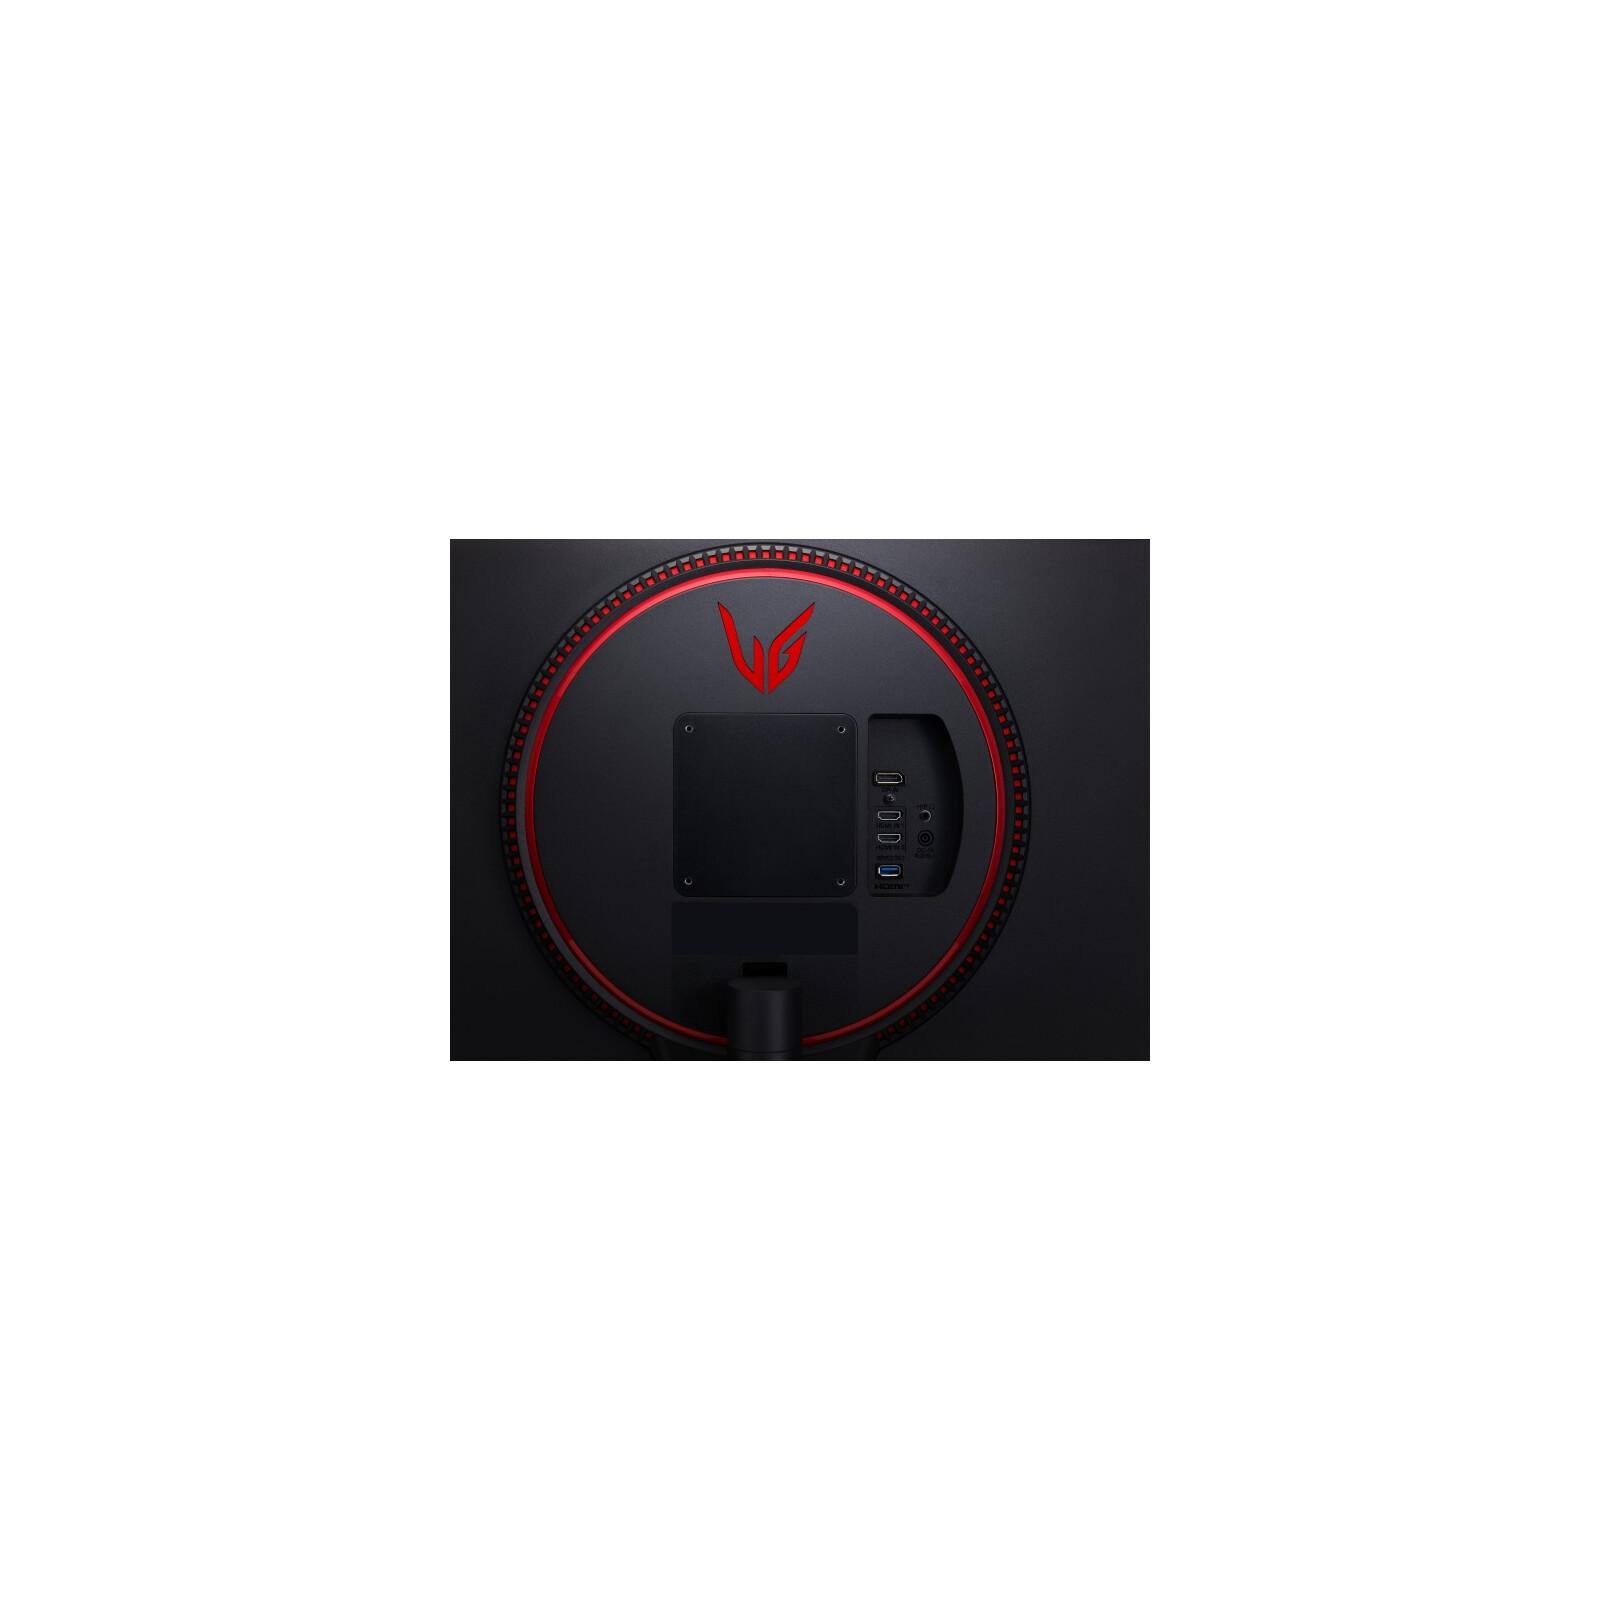 "LG 27"" 27GN800 UltraGear IPS Gaming Monitor"